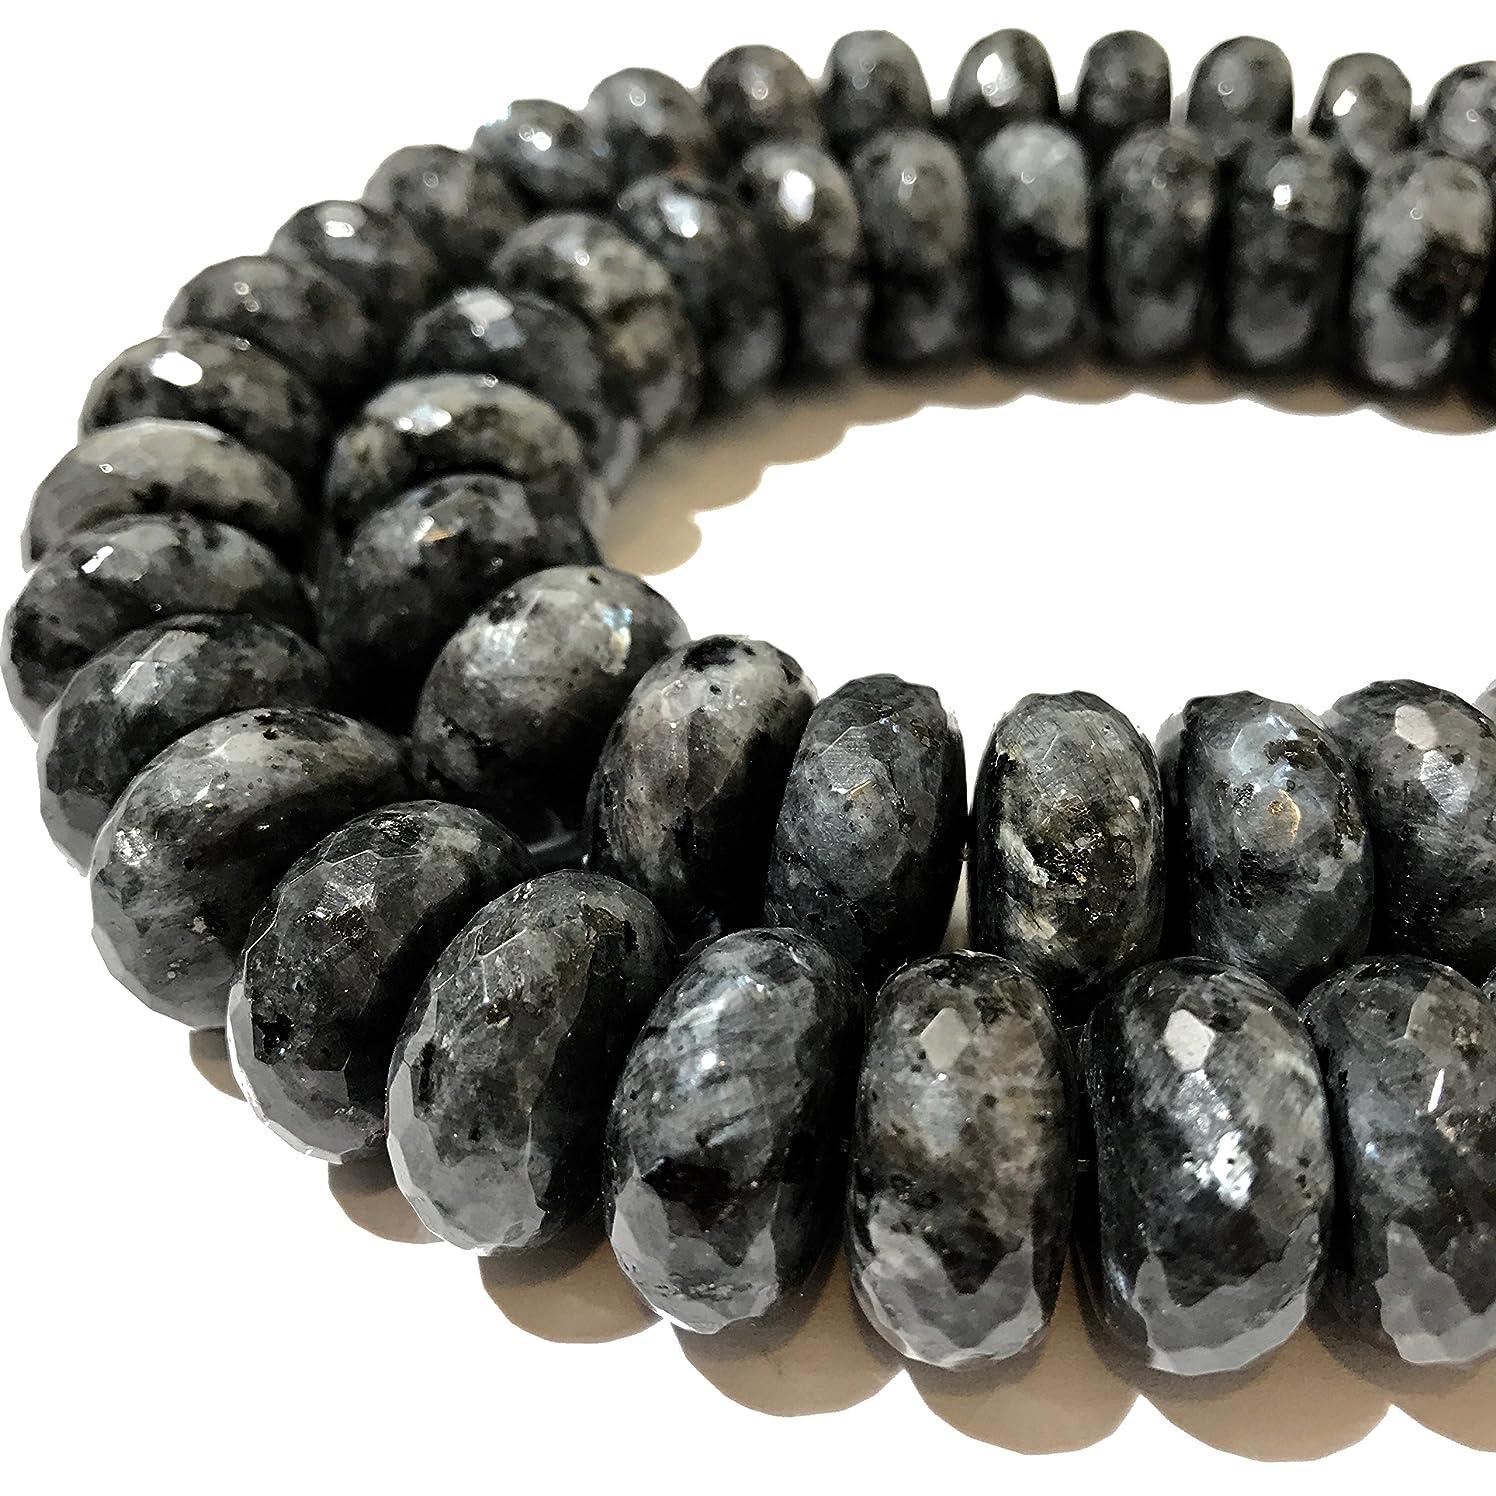 [ABCgems] Rare Norwegian Larvikite AKA Black Labradorite (Exquisite Pearly Gray Matrix) 16mm Faceted Rondelle Beads for Beading & Jewelry Making